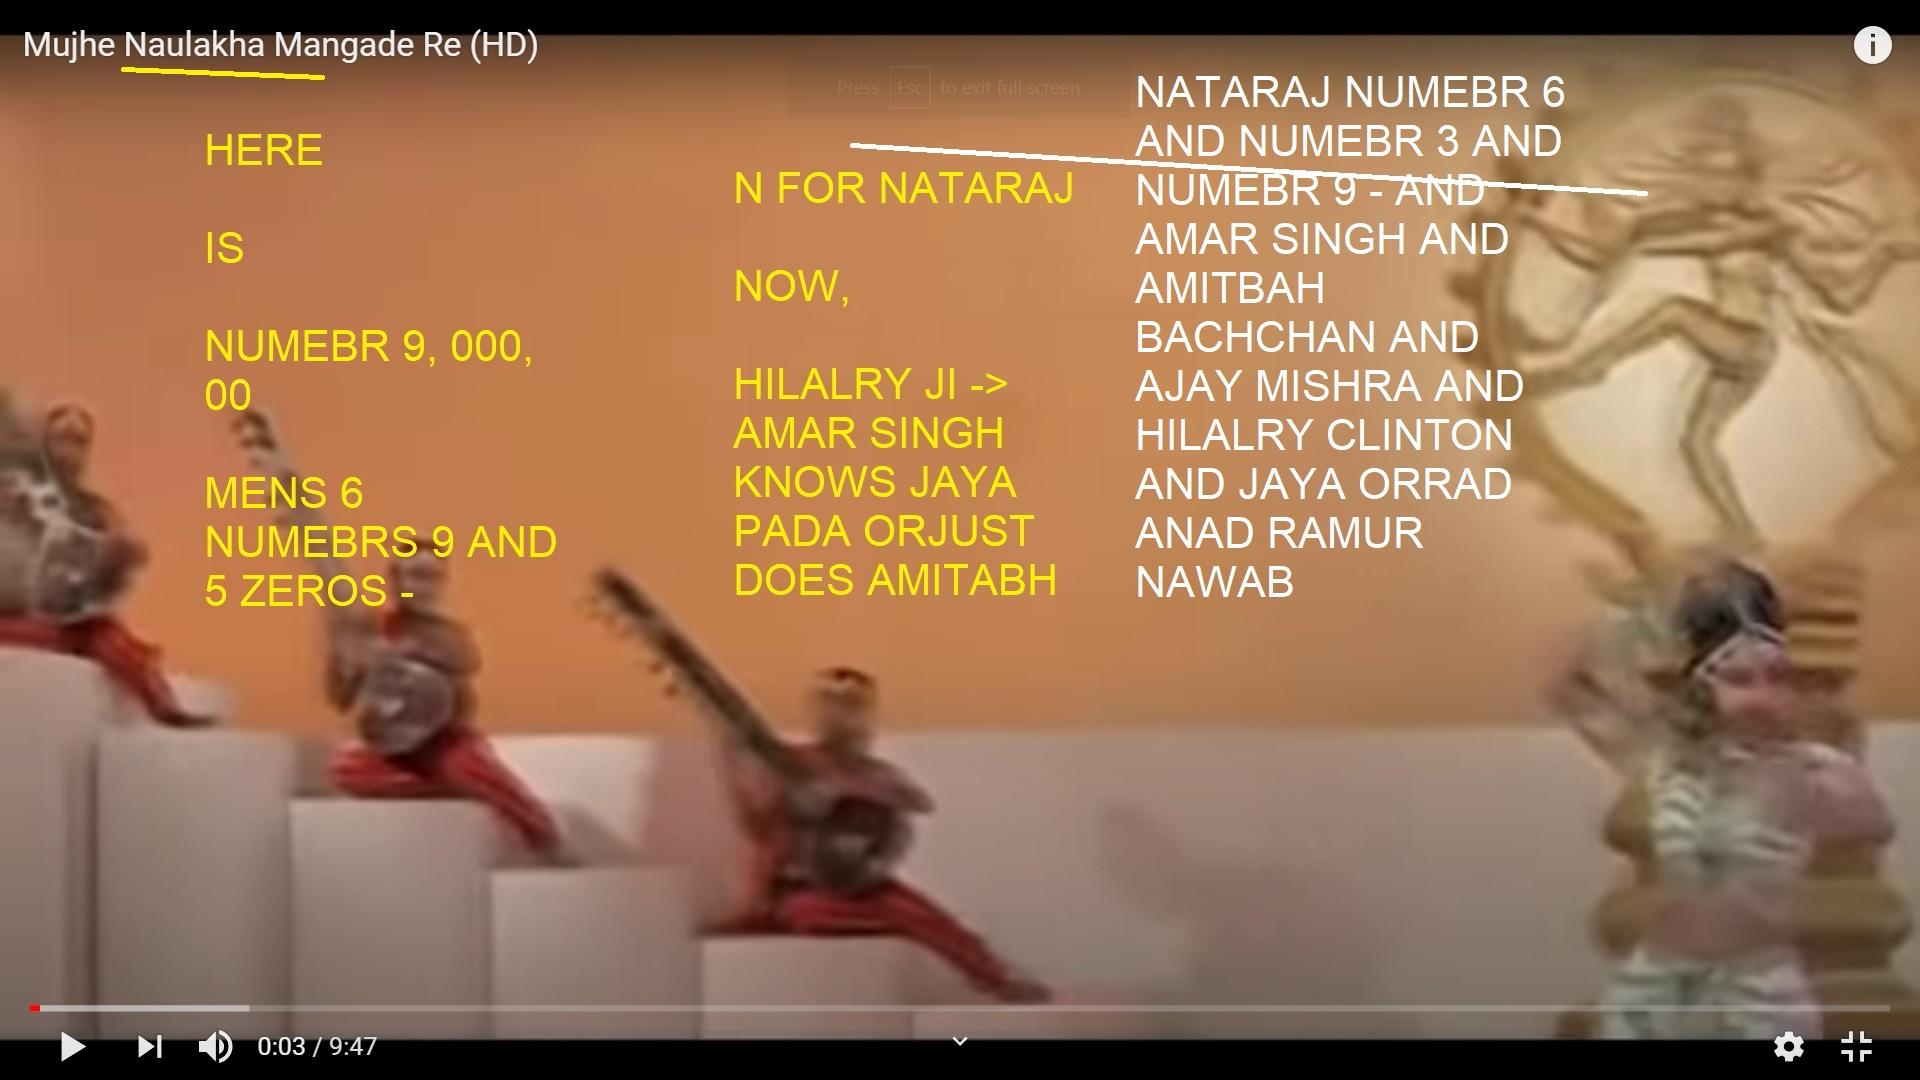 NATARAJ NUMEBR 6 AND NUMEBR 3 AND NUMEBR 9 - AND AMAR SINGH AND AMITBAH BACHCHAN AND AJAY MISHRA AND HILALRY CLINTON AND JAYA ORRAD ANAD RAMUR NAWAB